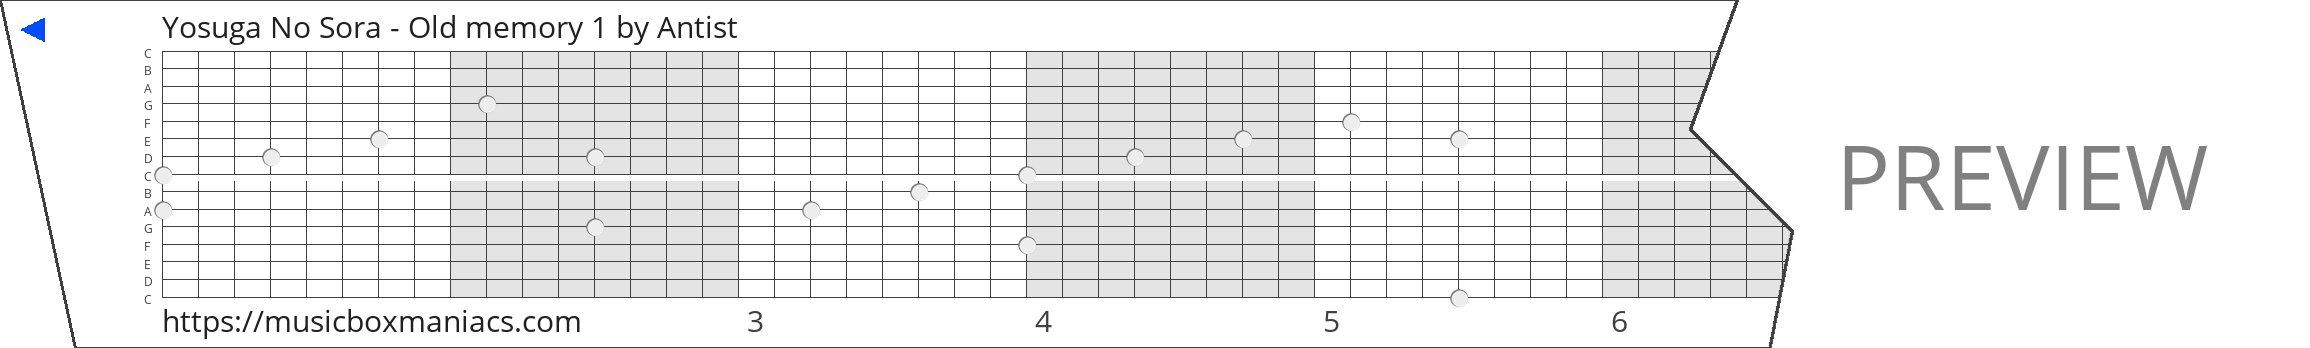 Yosuga No Sora - Old Memory 1 15 note music box paper strip